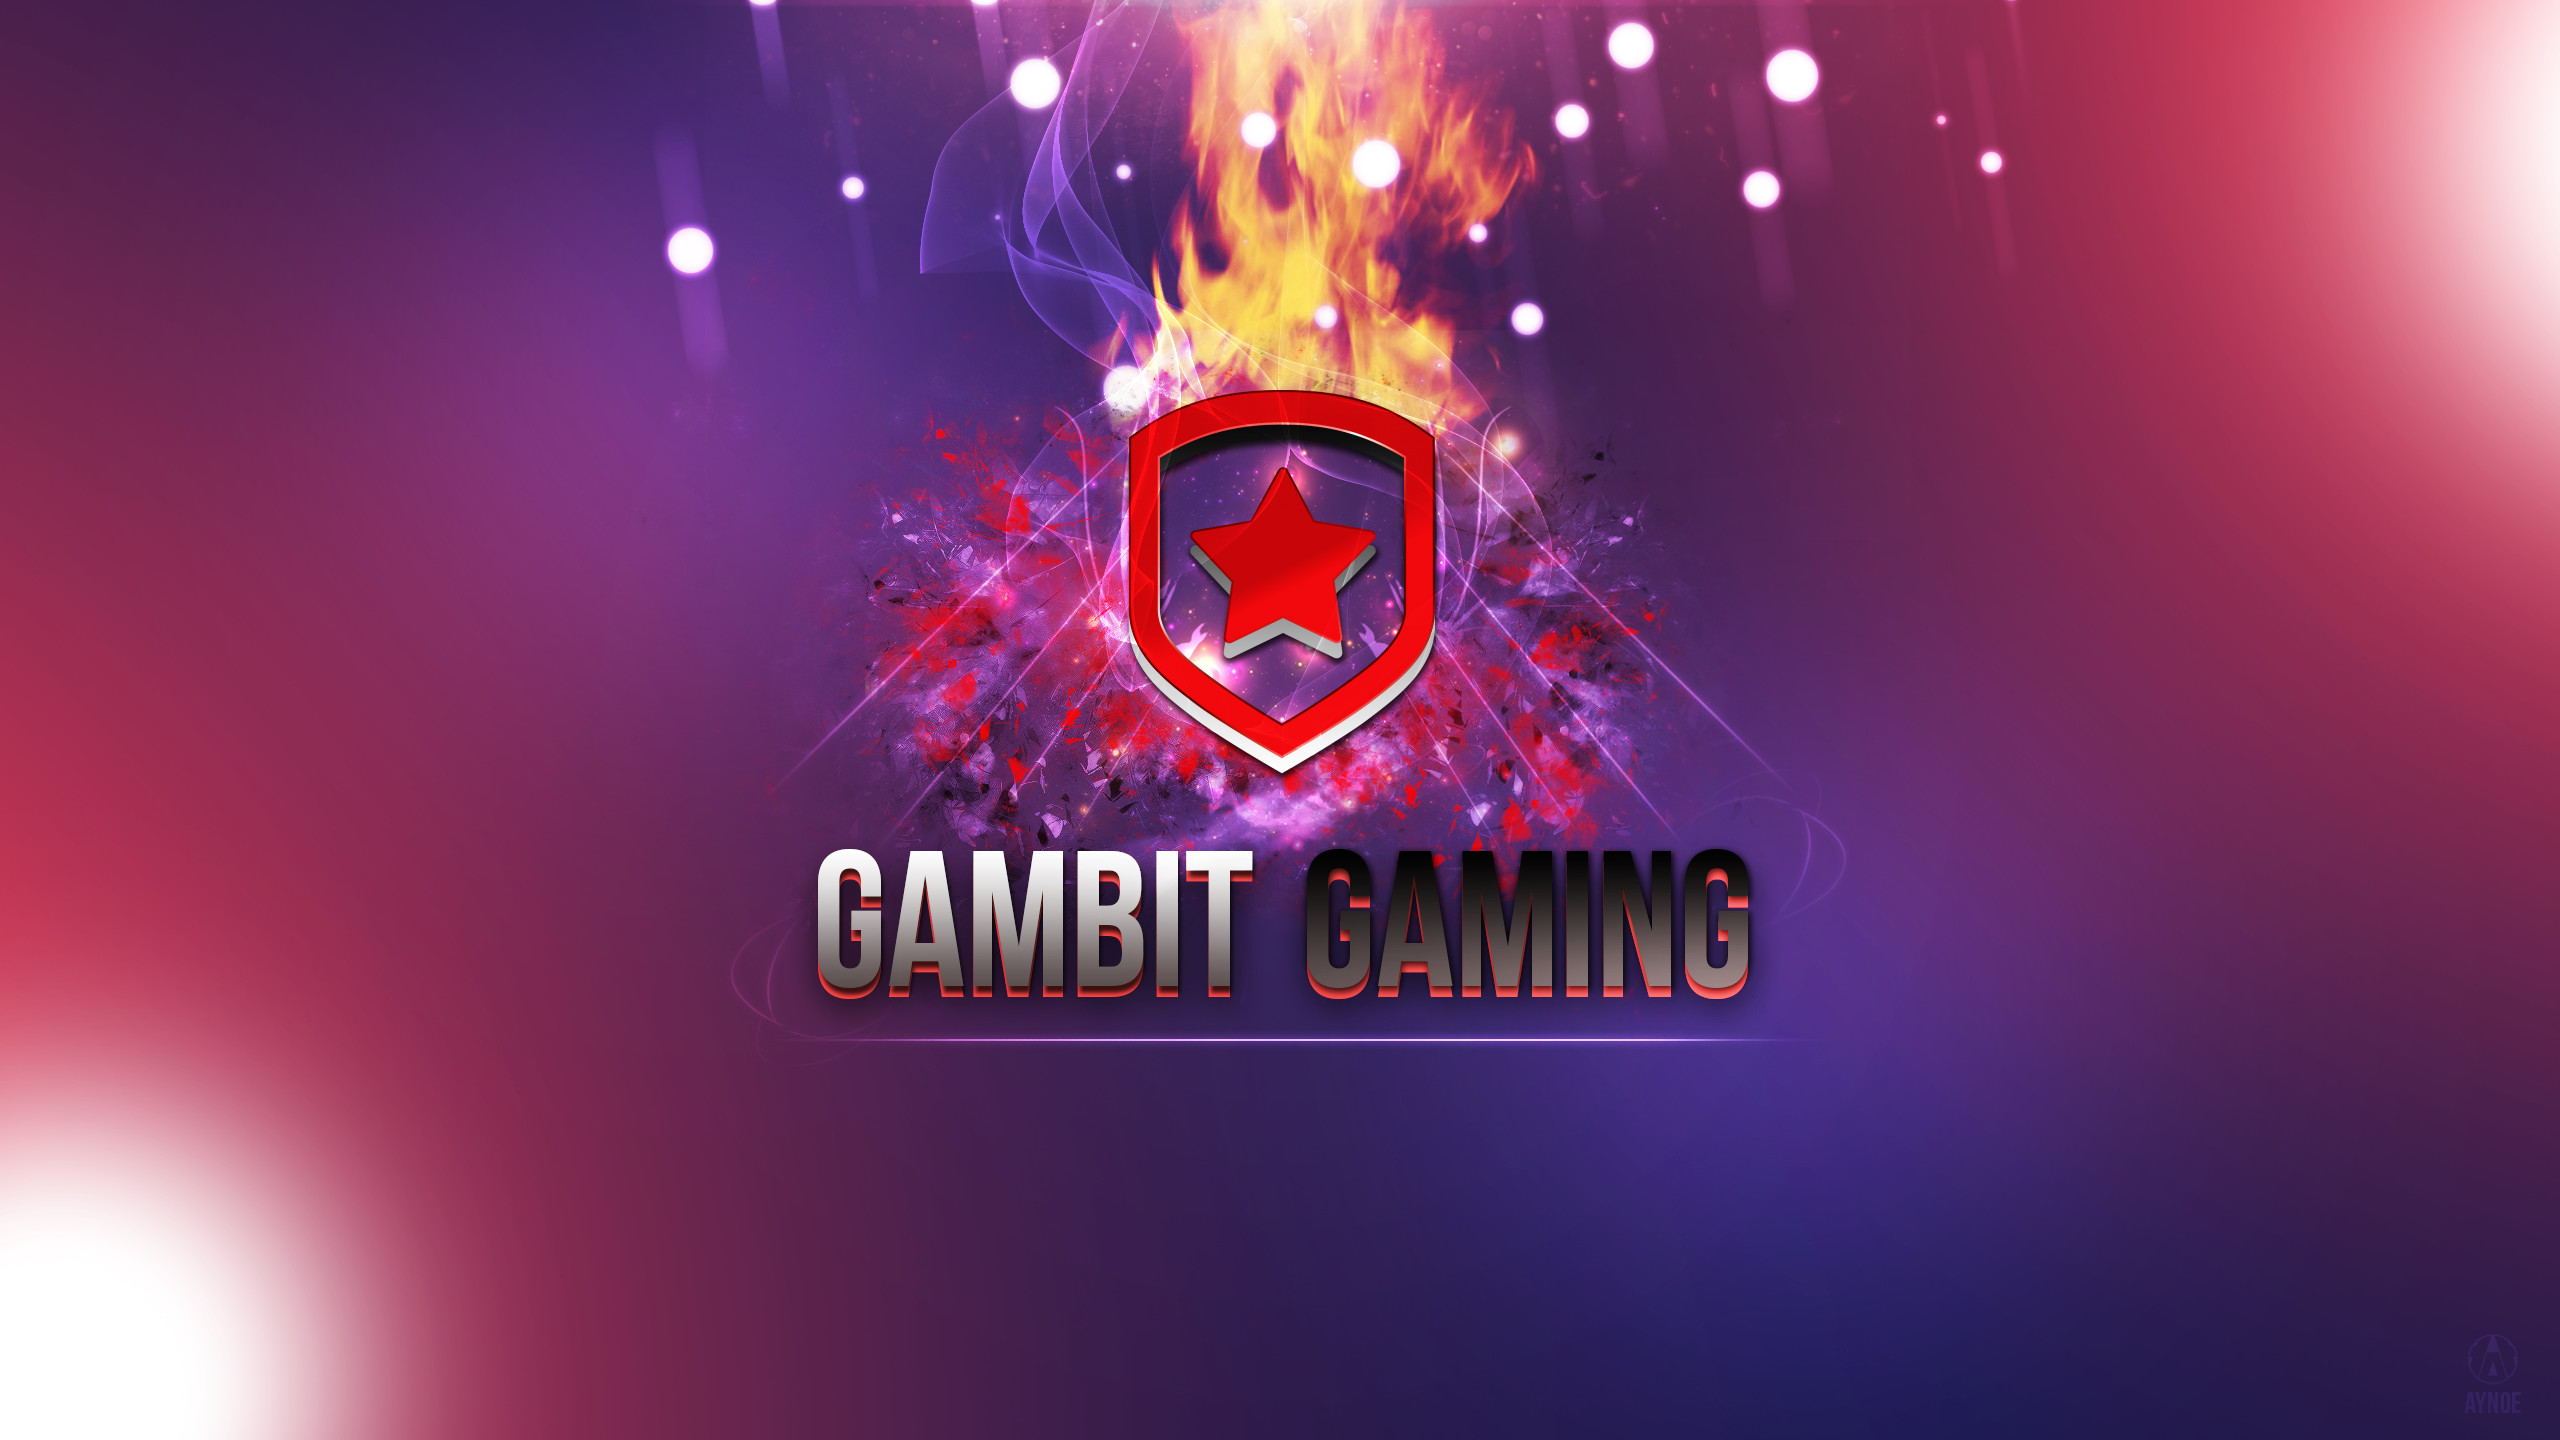 … Gambit Gaming 2 Wallpaper Logo – League of Legends by Aynoe